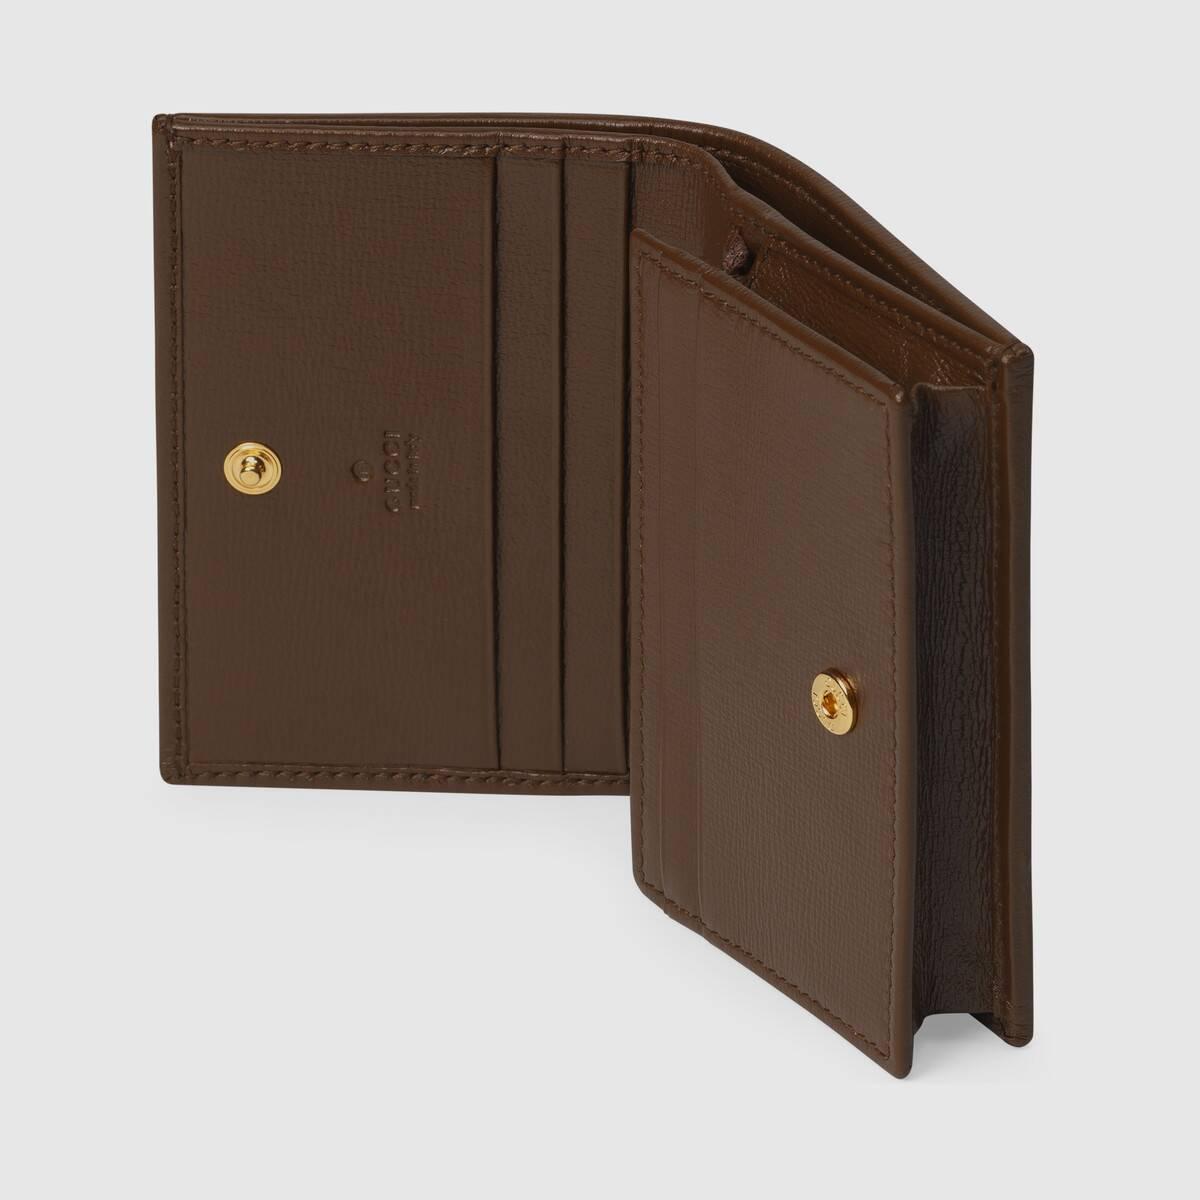 621887_92TCG_8563_006_080_0000_Light-Gucci-Horsebit-1955-card-case-wallet.jpg